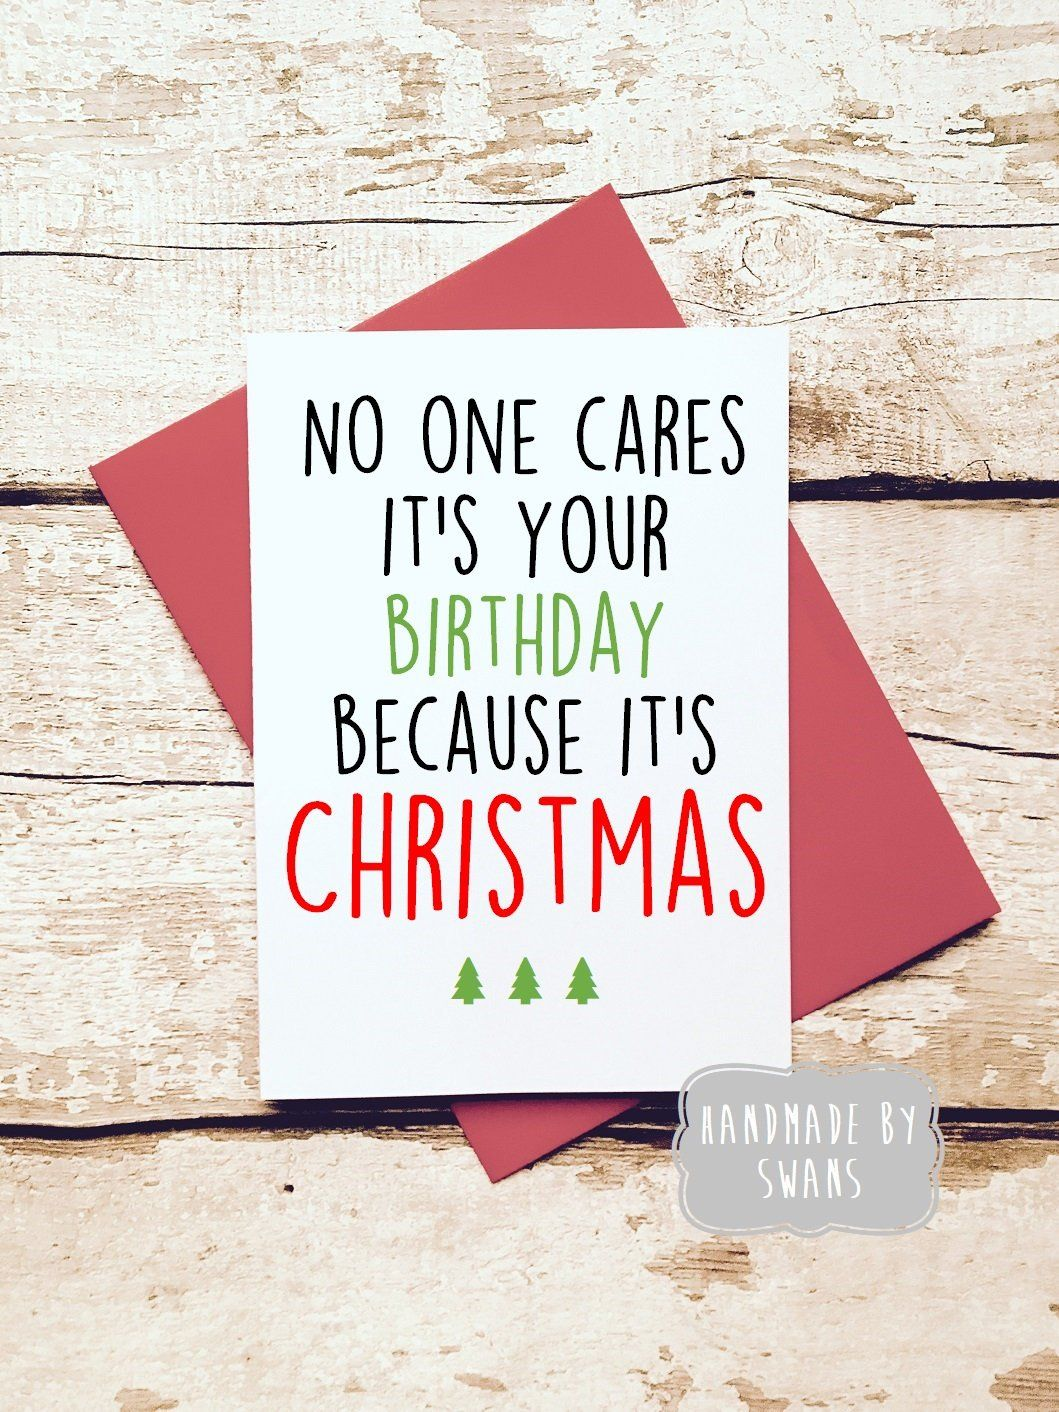 Funny Christmas Card Birthday Card Christmas Card Funny Etsy Christmas Cards Funny Christmas Cards Christmas Card Packs